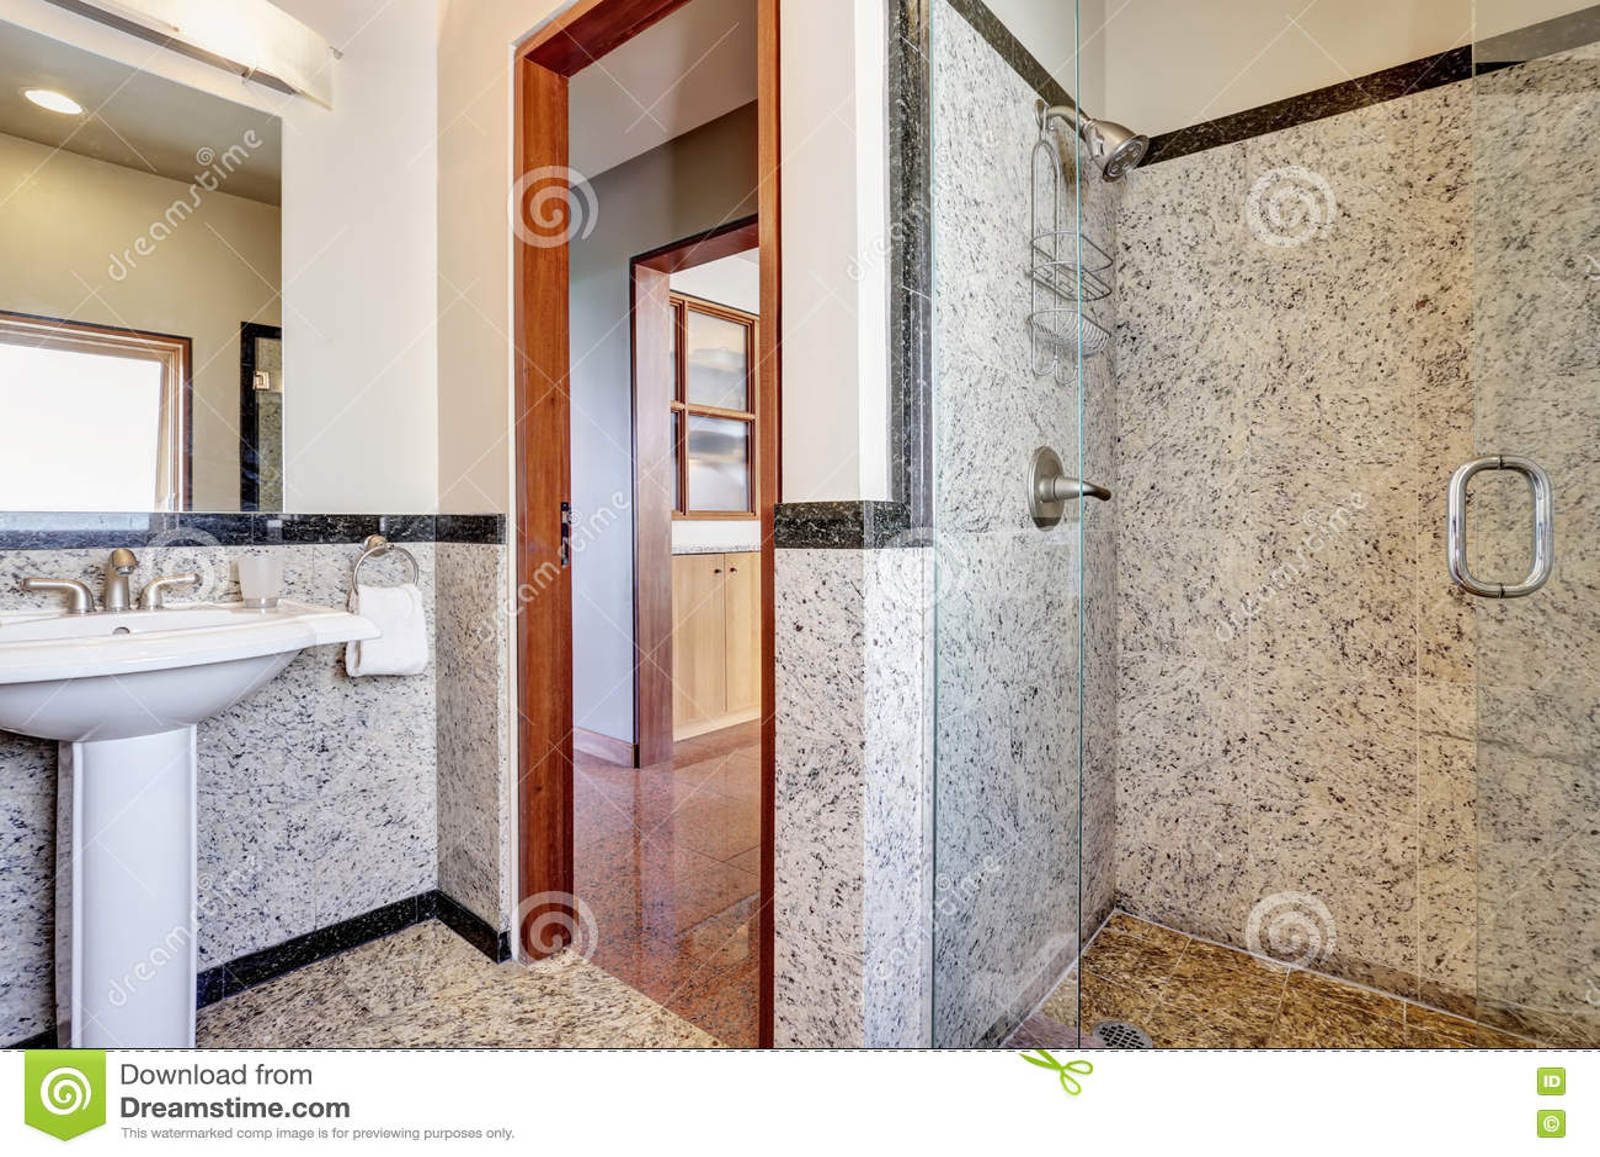 Modern marble bathroom with walk-in shower.